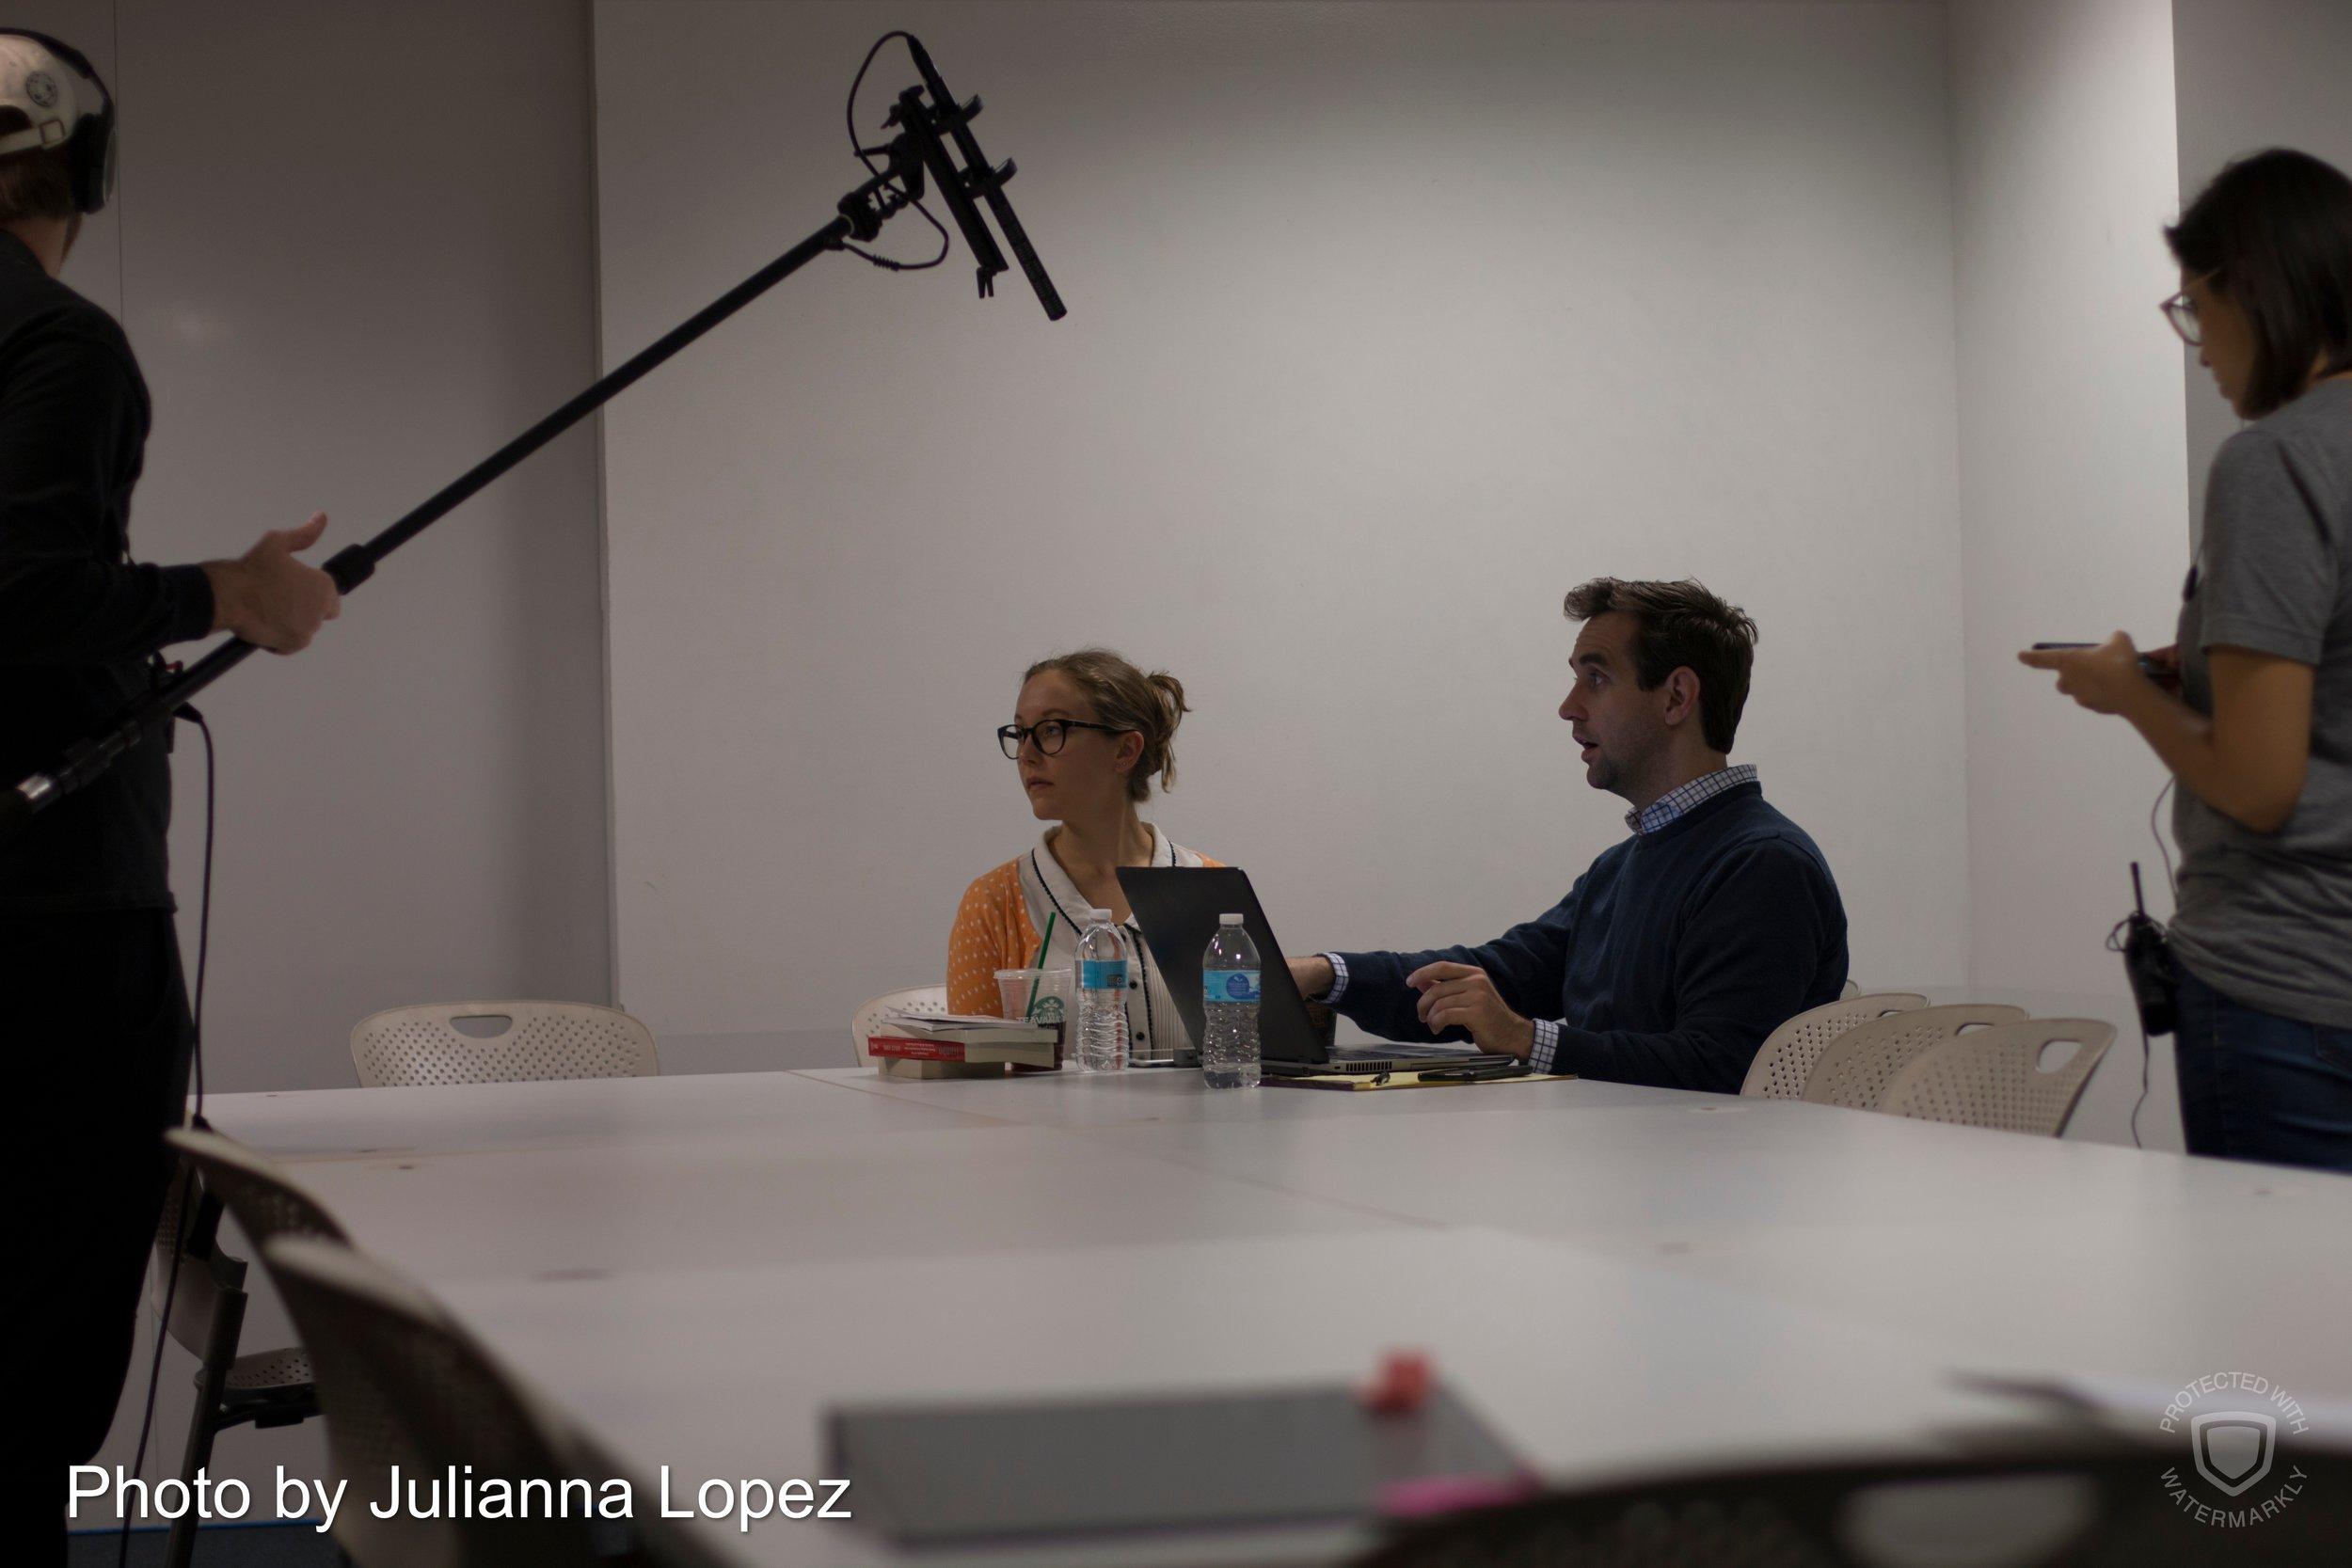 Julianna Lopez - IMG_6306.jpg